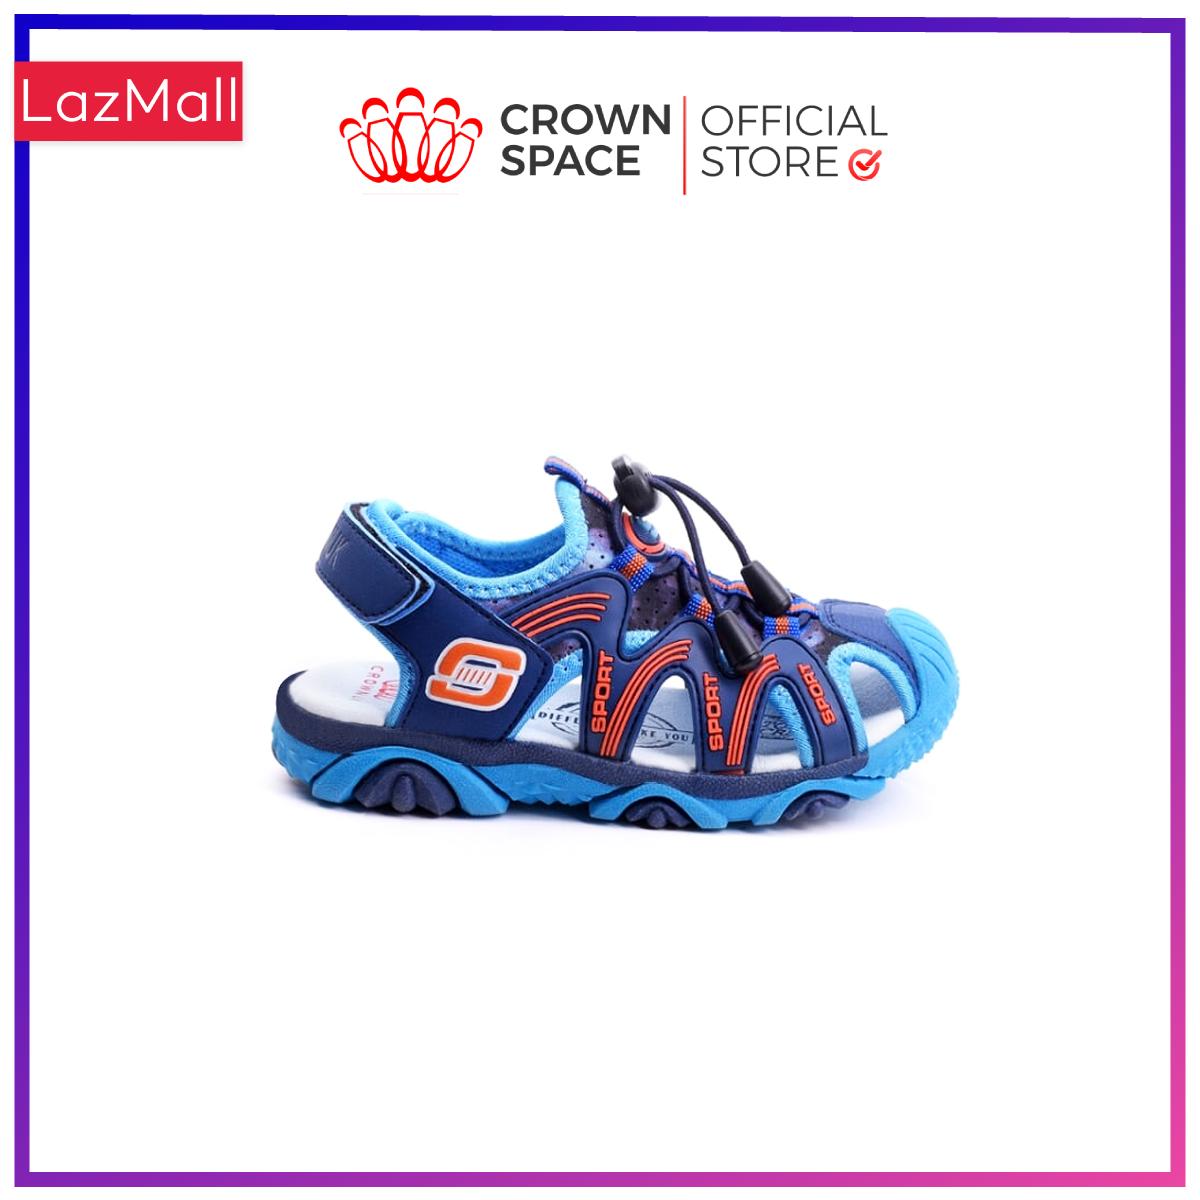 Sandal Bé Trai Chính Hãng CrownUK Active Sandals CRUK803